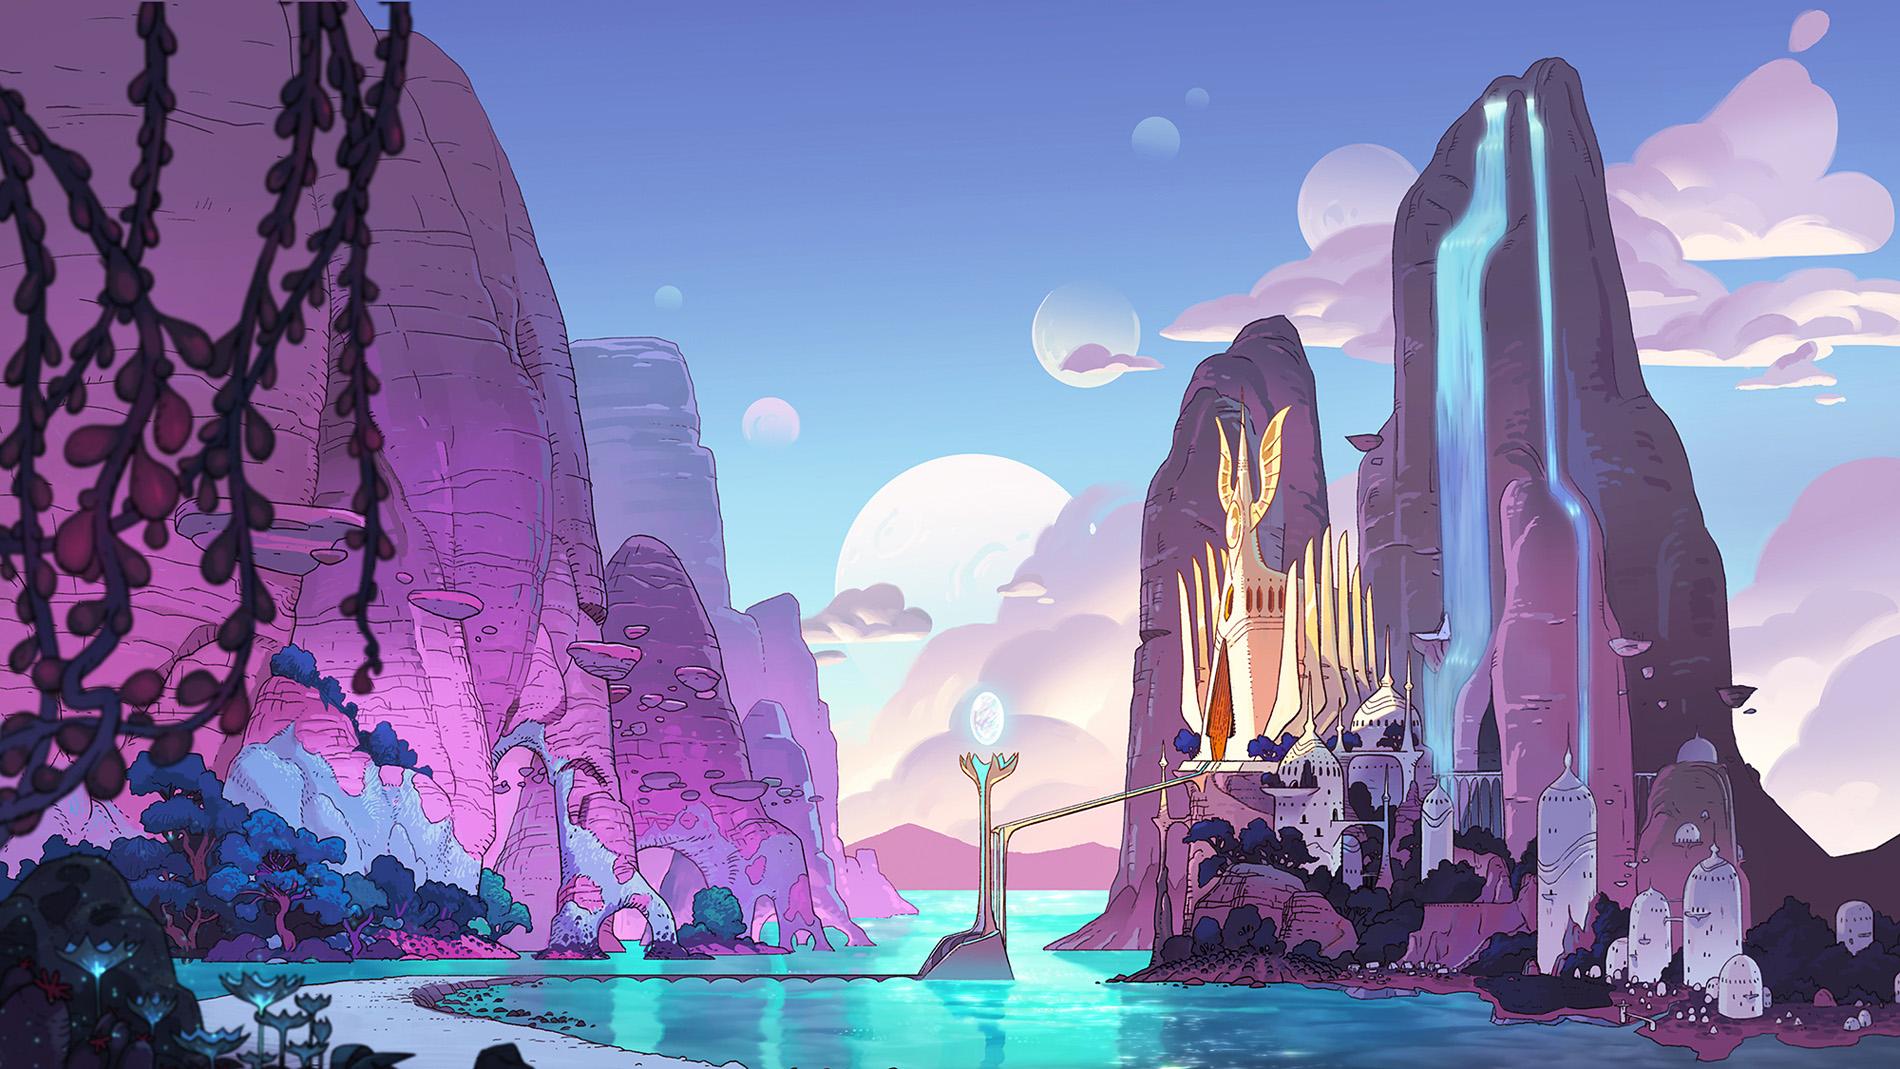 DreamWorks She-Ra and the Princesses of Power Season 2